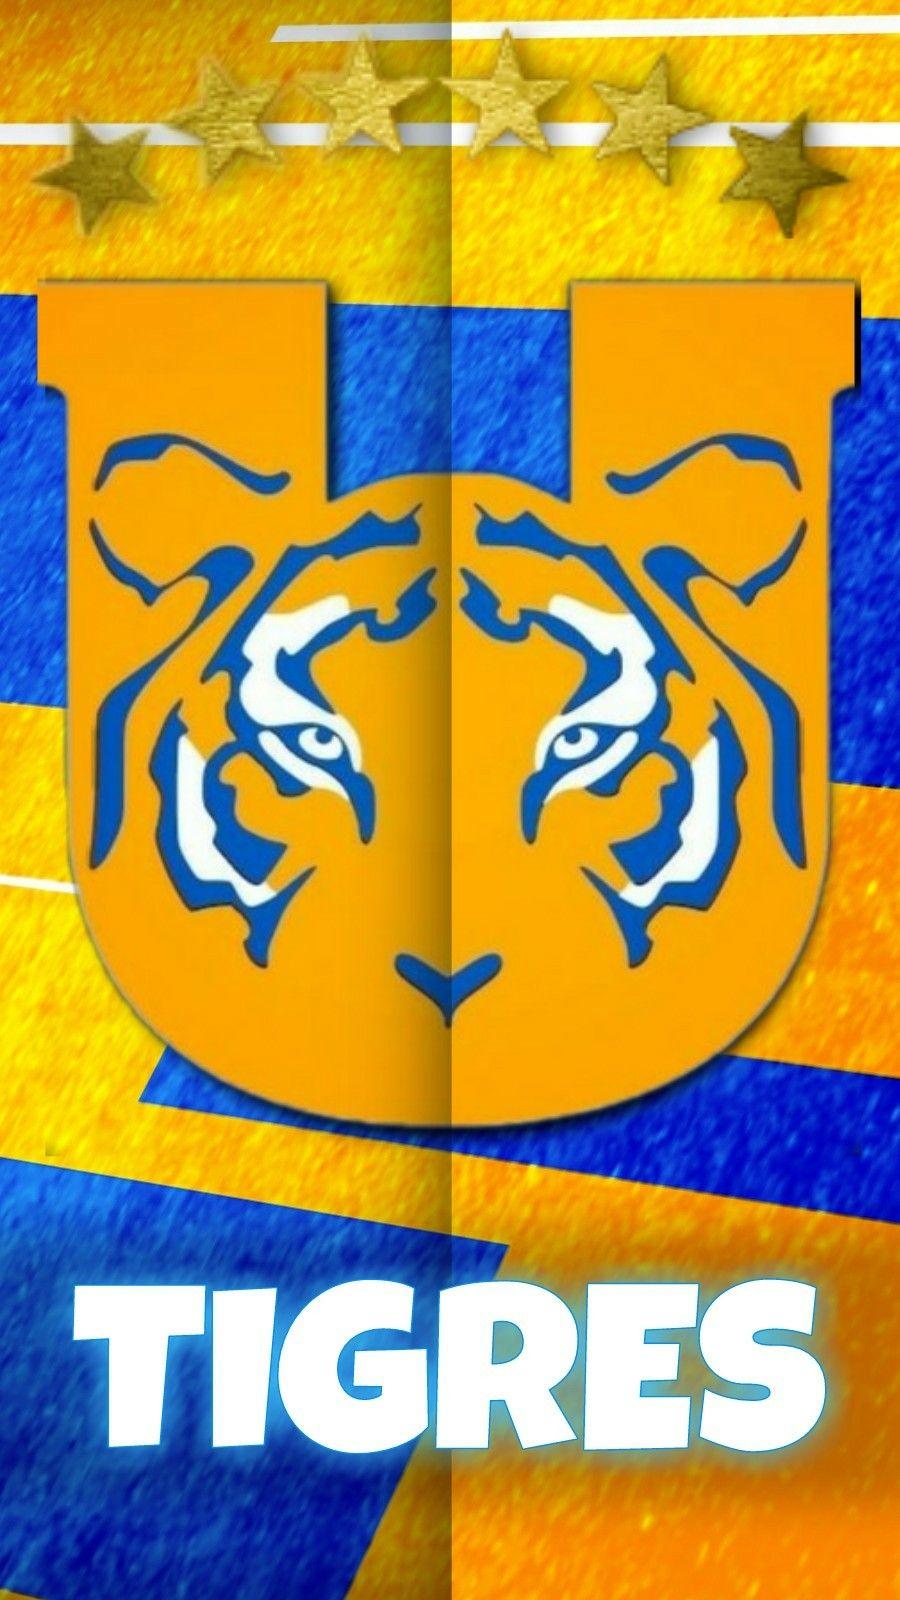 Tigres UANL Fondo de Pantalla Tigres uanl, Tigre, Tigres